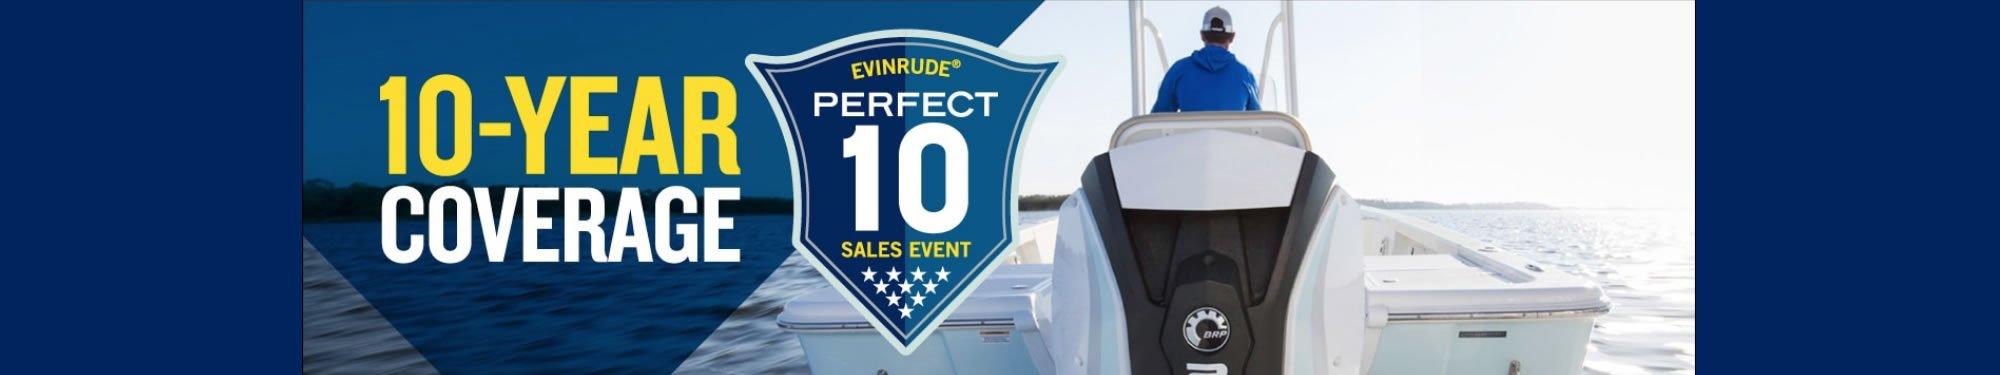 Evinrude Perfect 10 Sales Event 2019